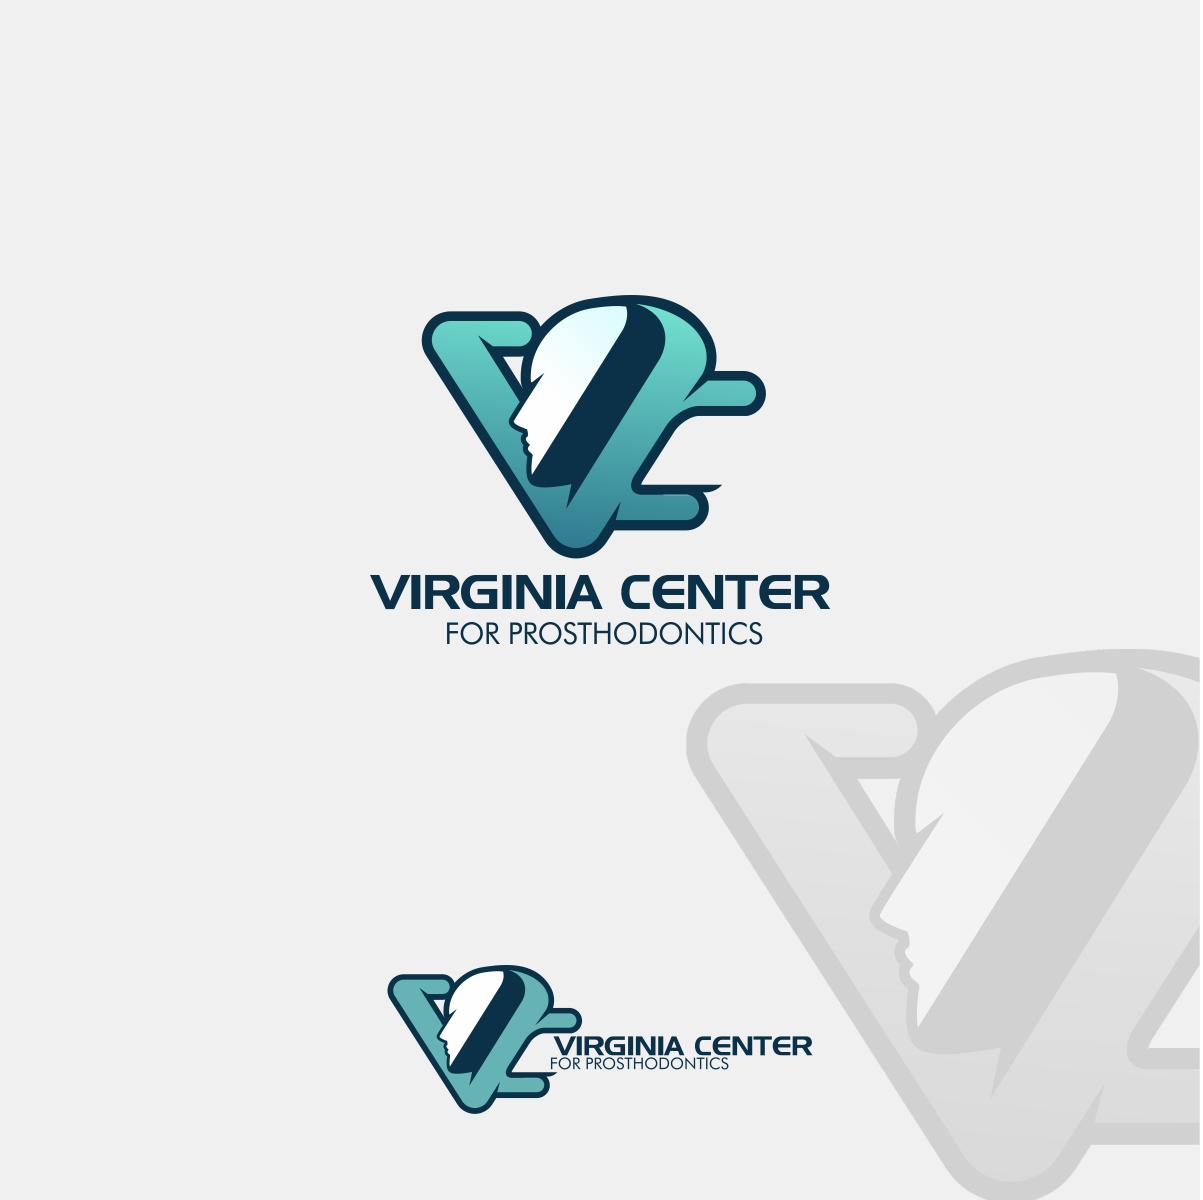 Logo Design by Private User - Entry No. 26 in the Logo Design Contest Imaginative Logo Design for Virginia Center for Prosthodontics.